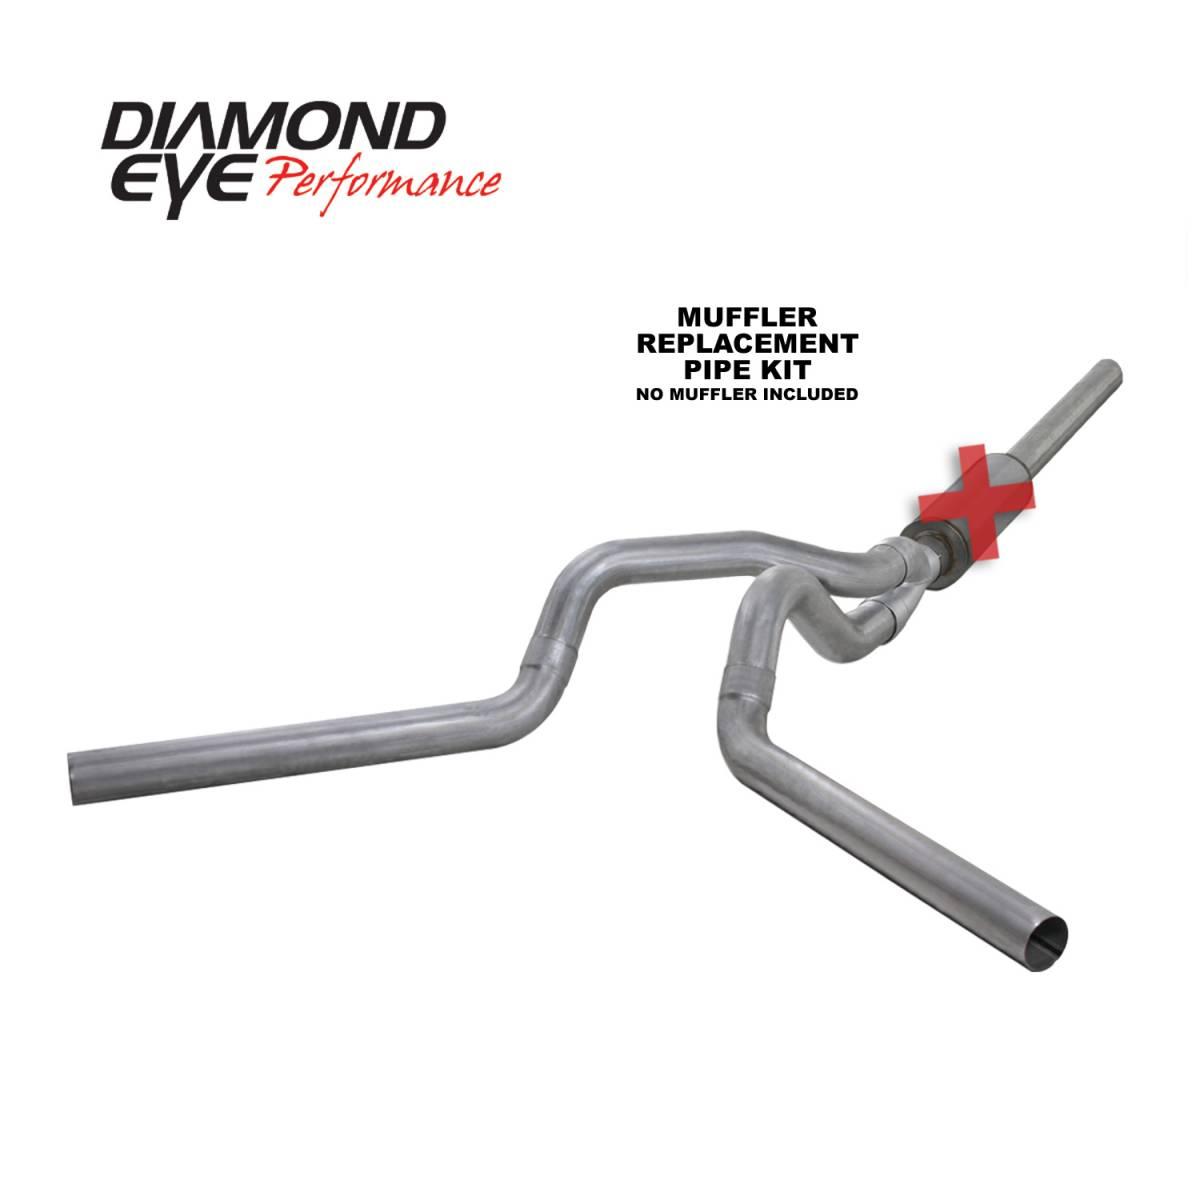 Diamond Eye Performance K A Rp 5 5 Dodge 5